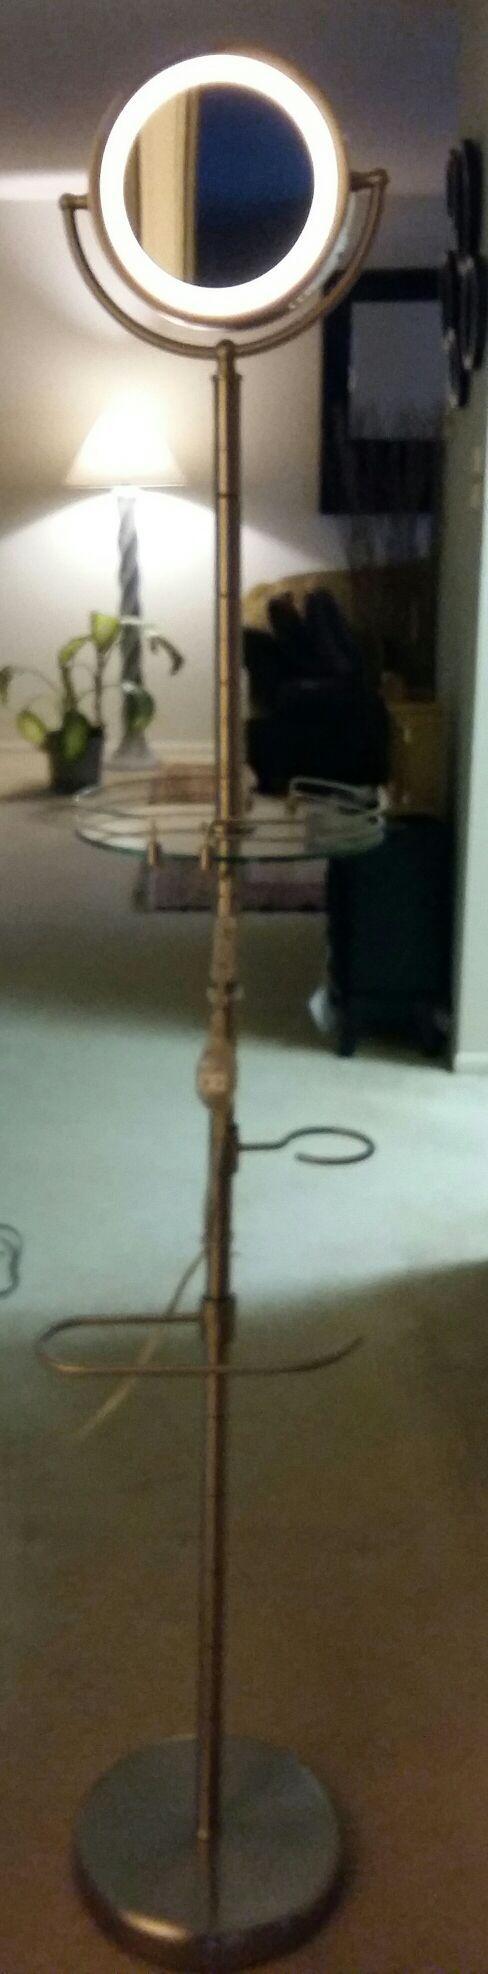 Floor standing makeup mirror (Furniture) in Lutherville-Timonium, MD ...